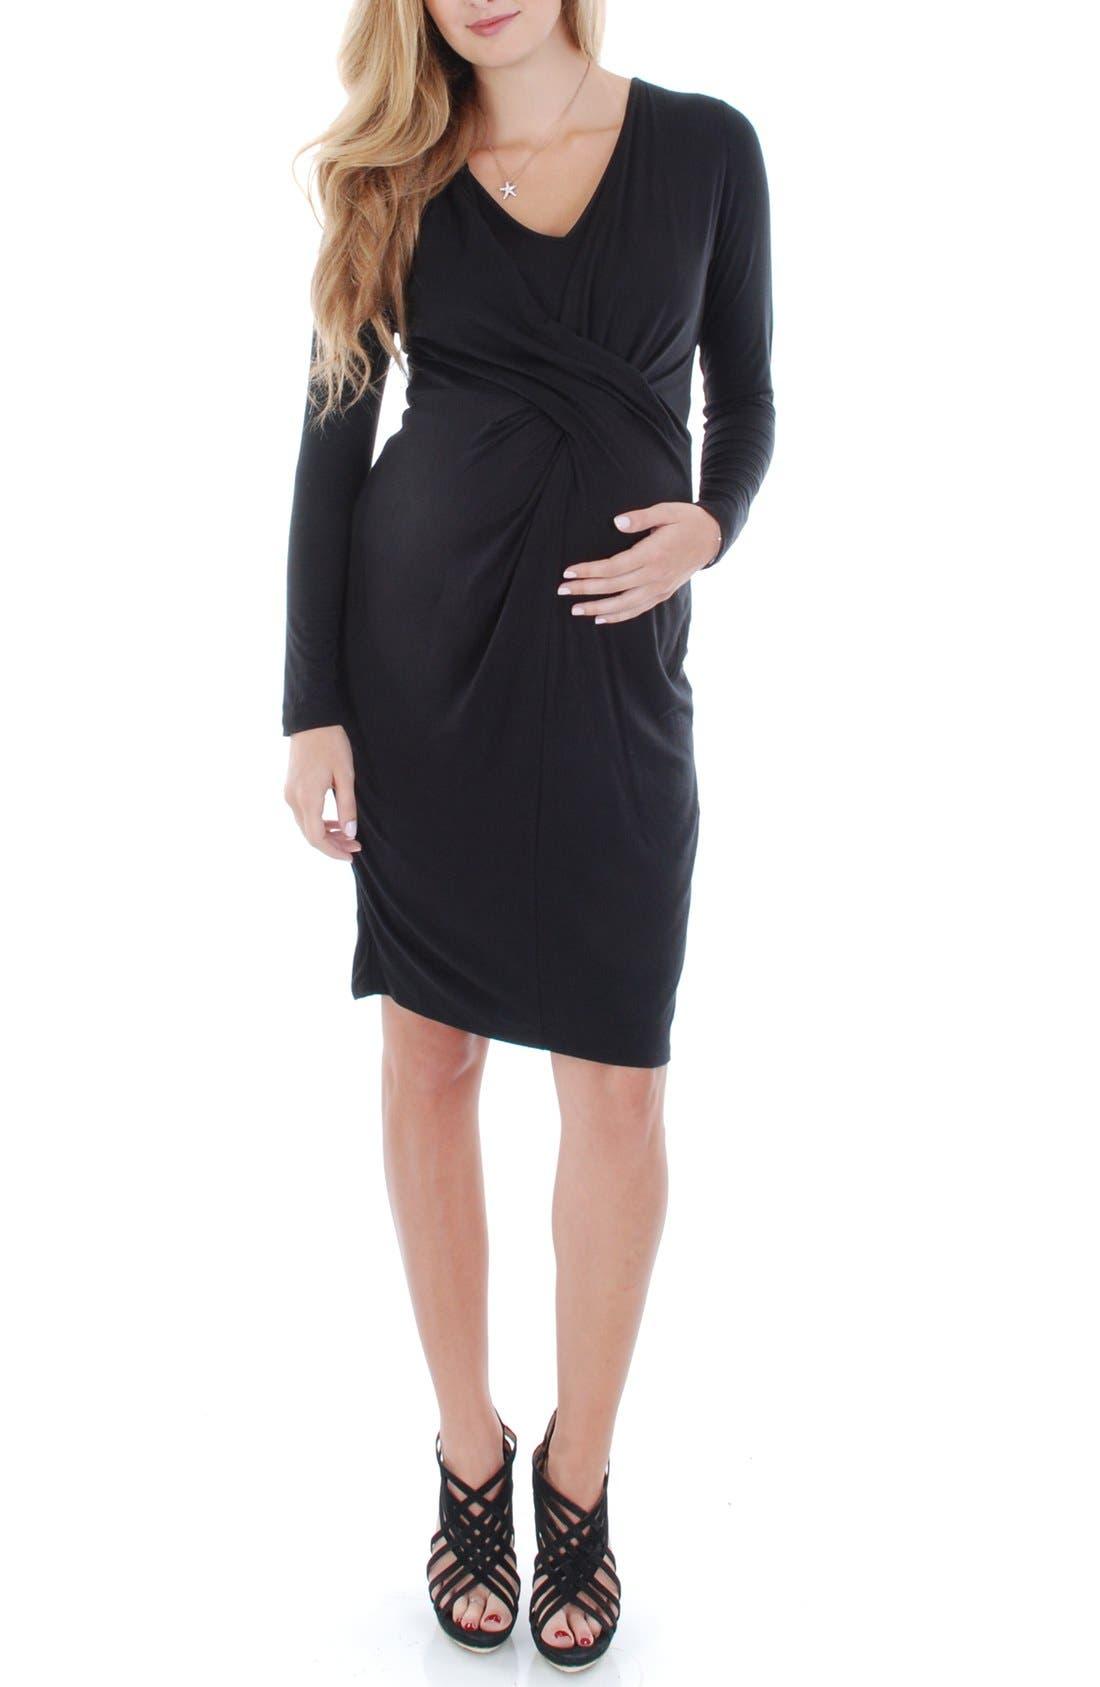 Main Image - Everly Grey 'Sloan' Maternity/Nursing Dress